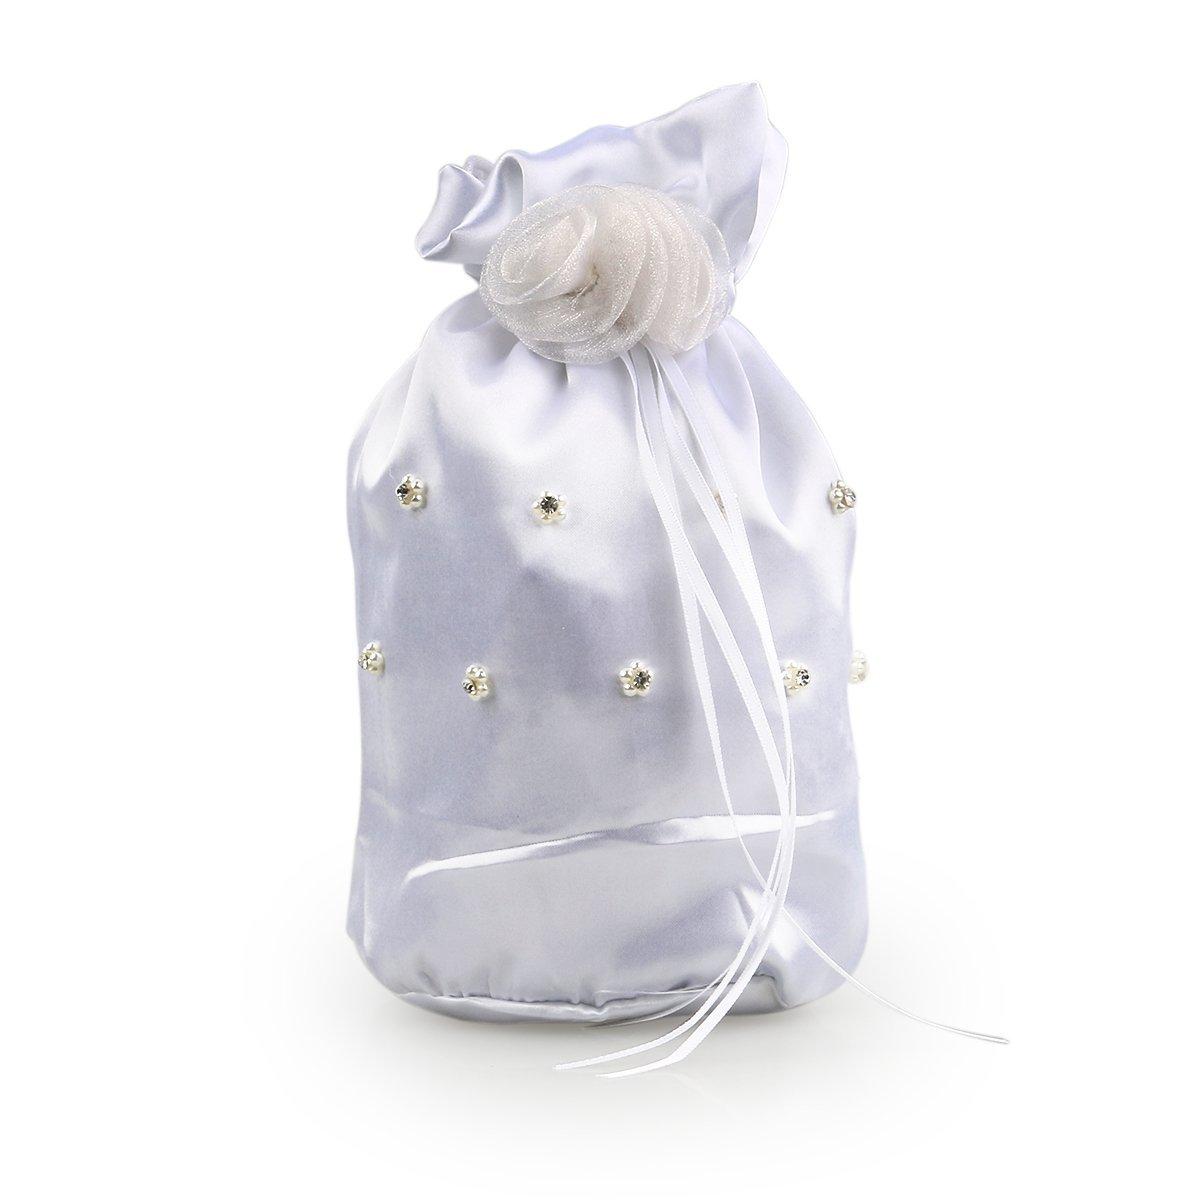 2bcf0a7d1c8f BESTOYARD Wedding Bags Satin Money Bag Bridal Bridesmaid Dolly Bag Handbag